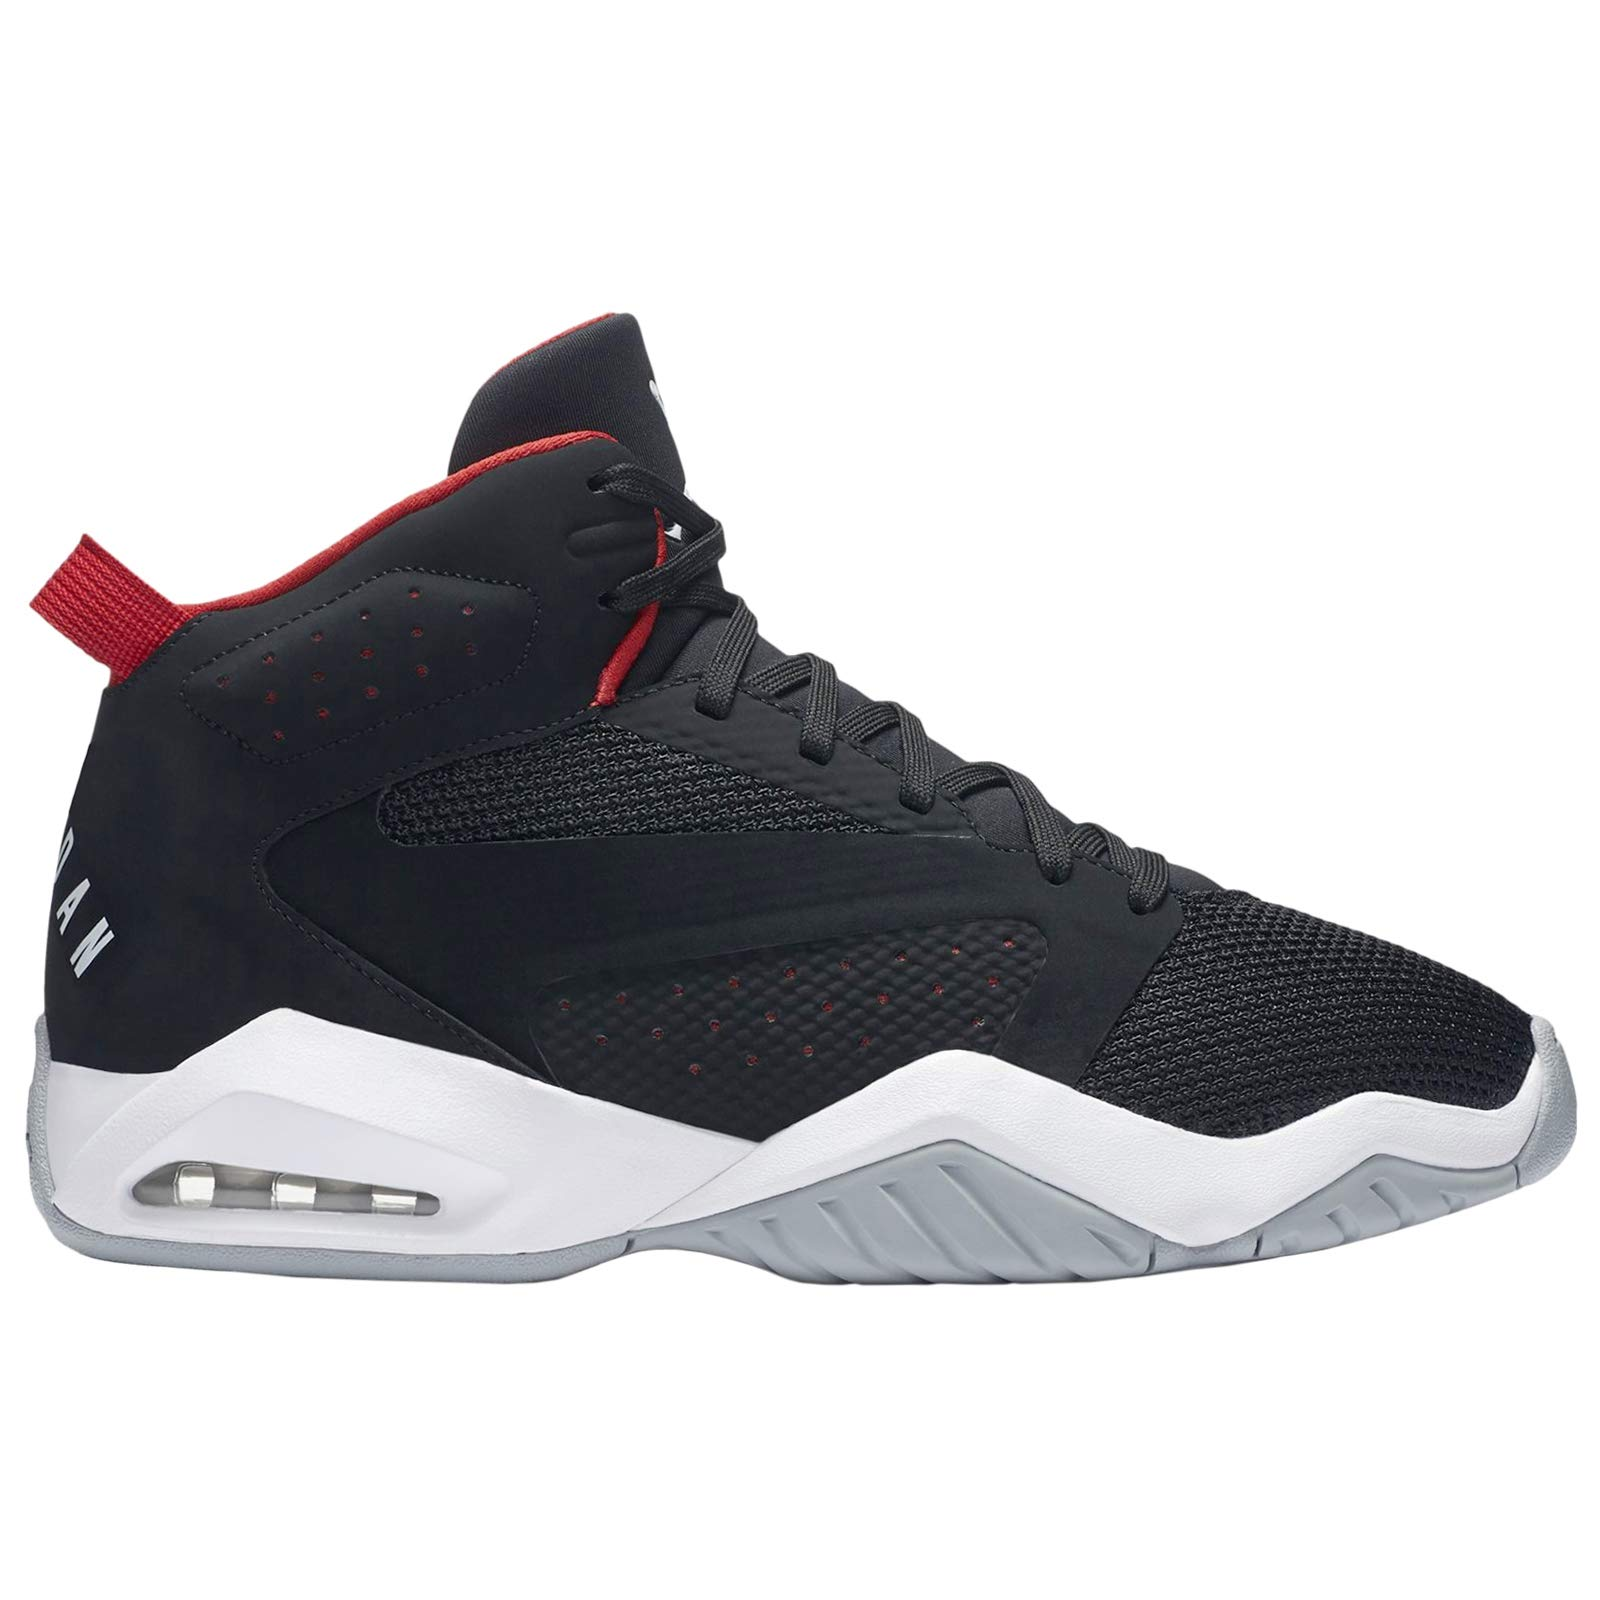 Jordan Nike Mens Lift Off Shoes, Black/White-University Red-Wolf Grey, 8